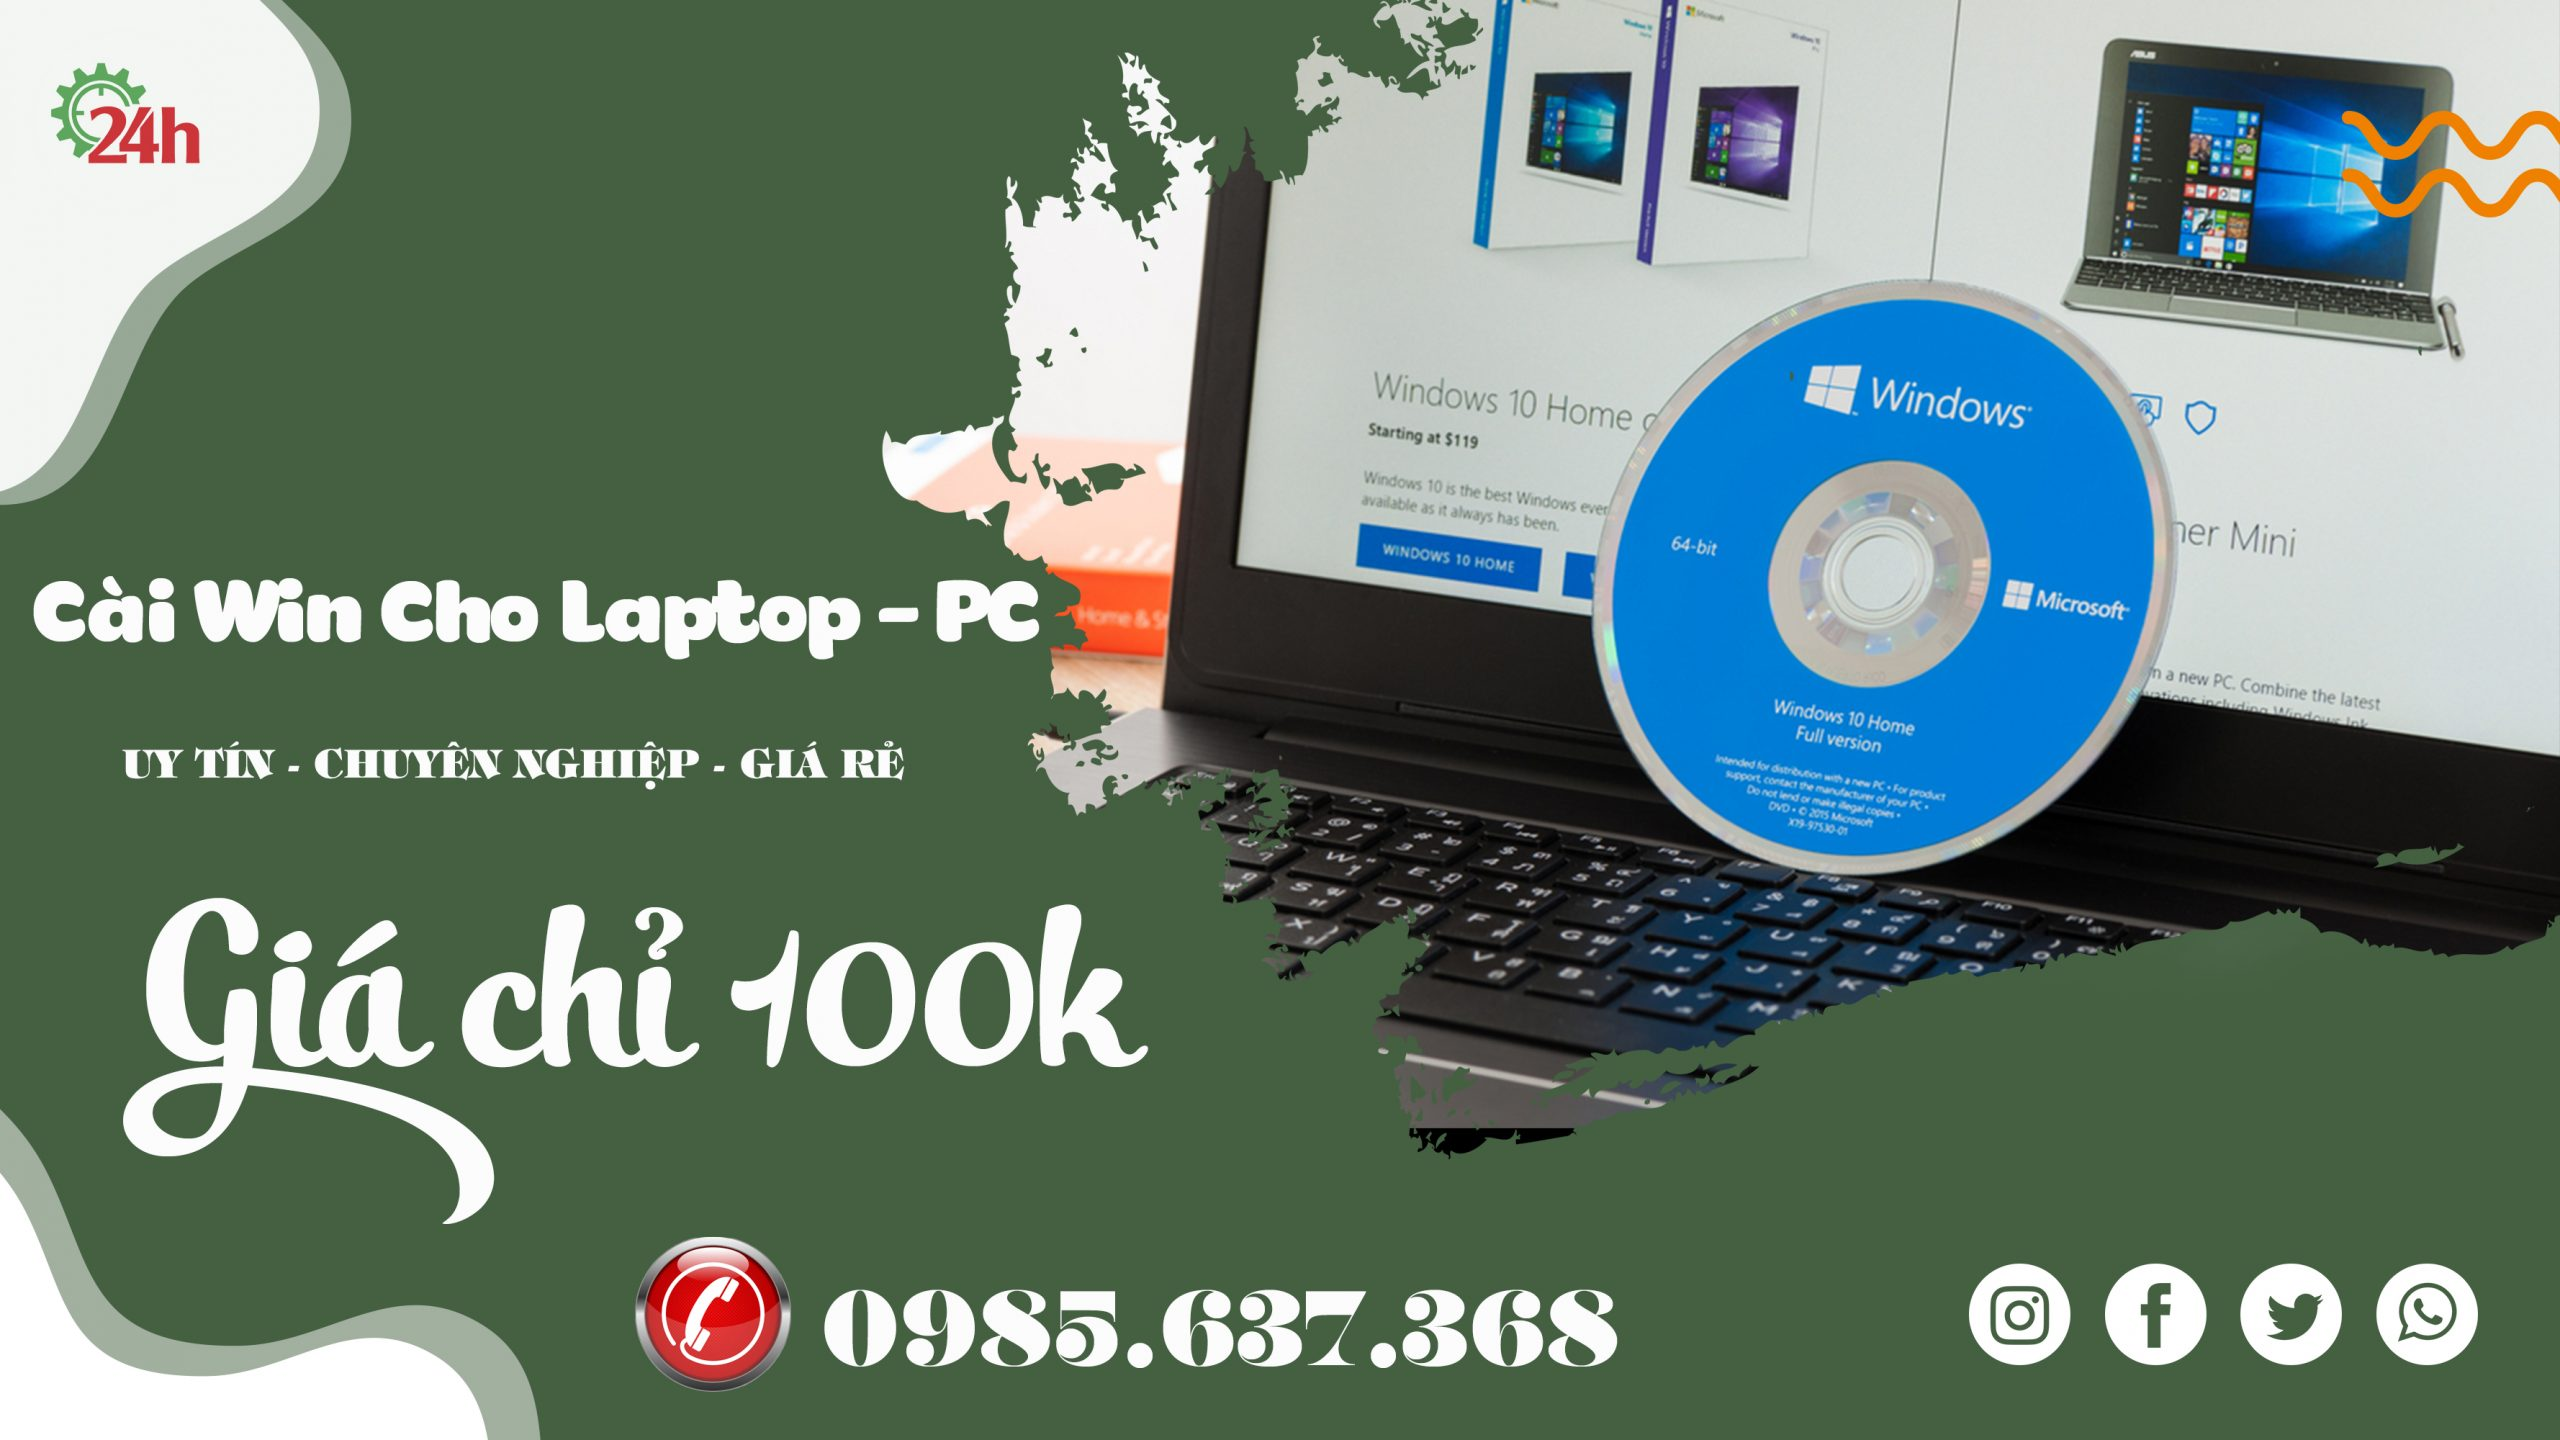 cai-win-cho-laptop-pc